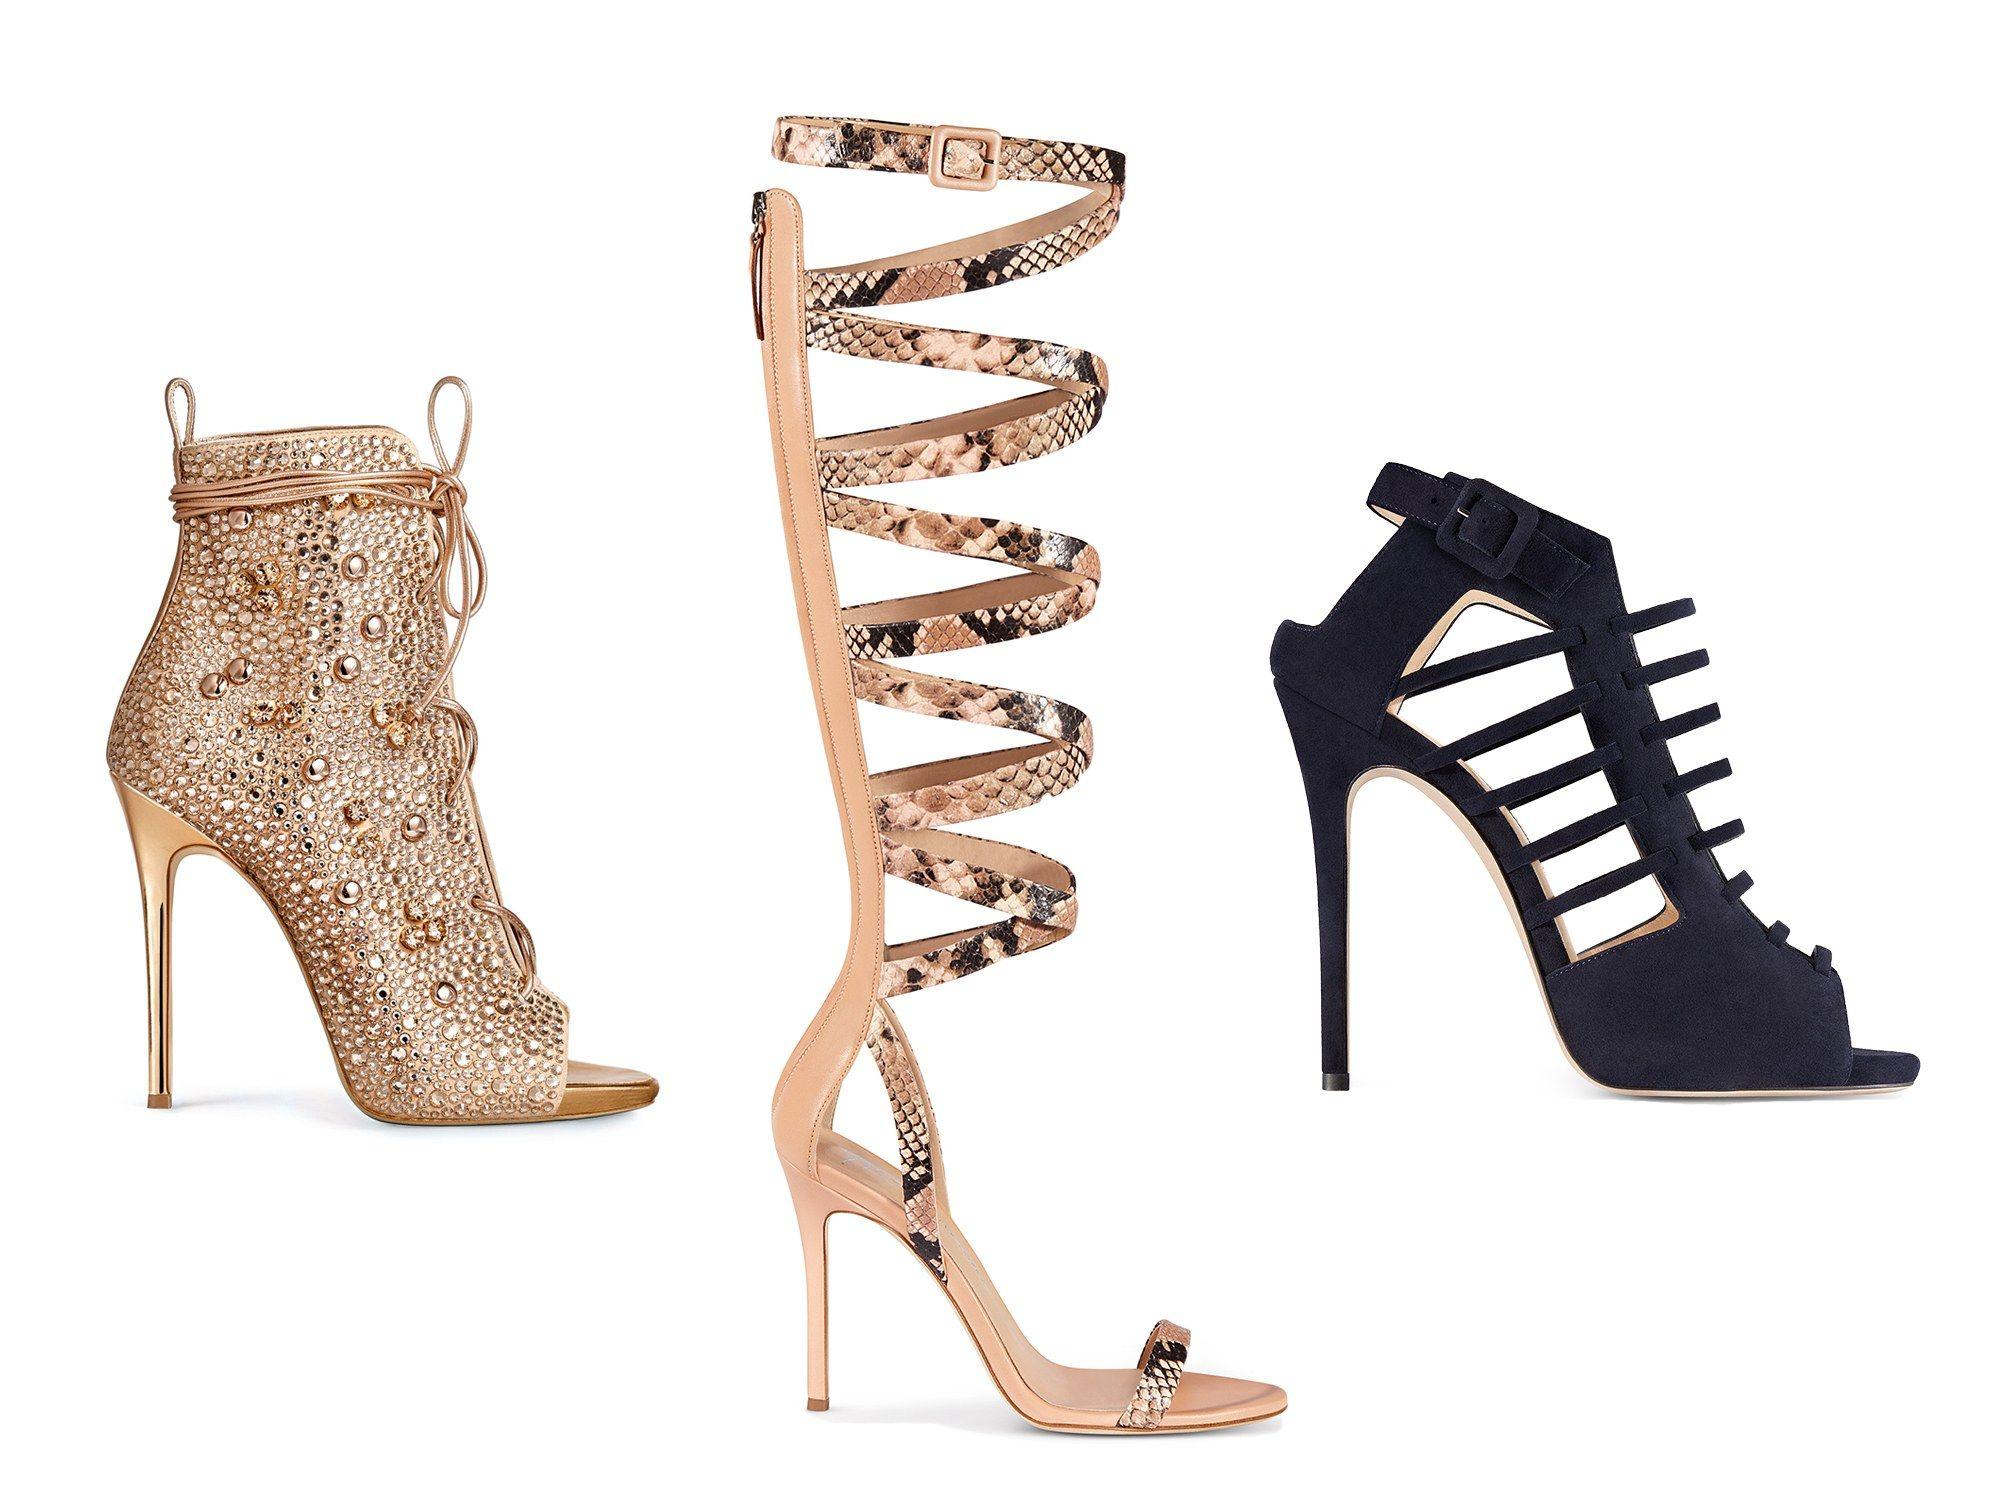 acb5a023885b Jennifer Lopez Launches a MAJOR New Shoe Line ✨ Follow CindyLBB✨ Instagram    cindyslbb